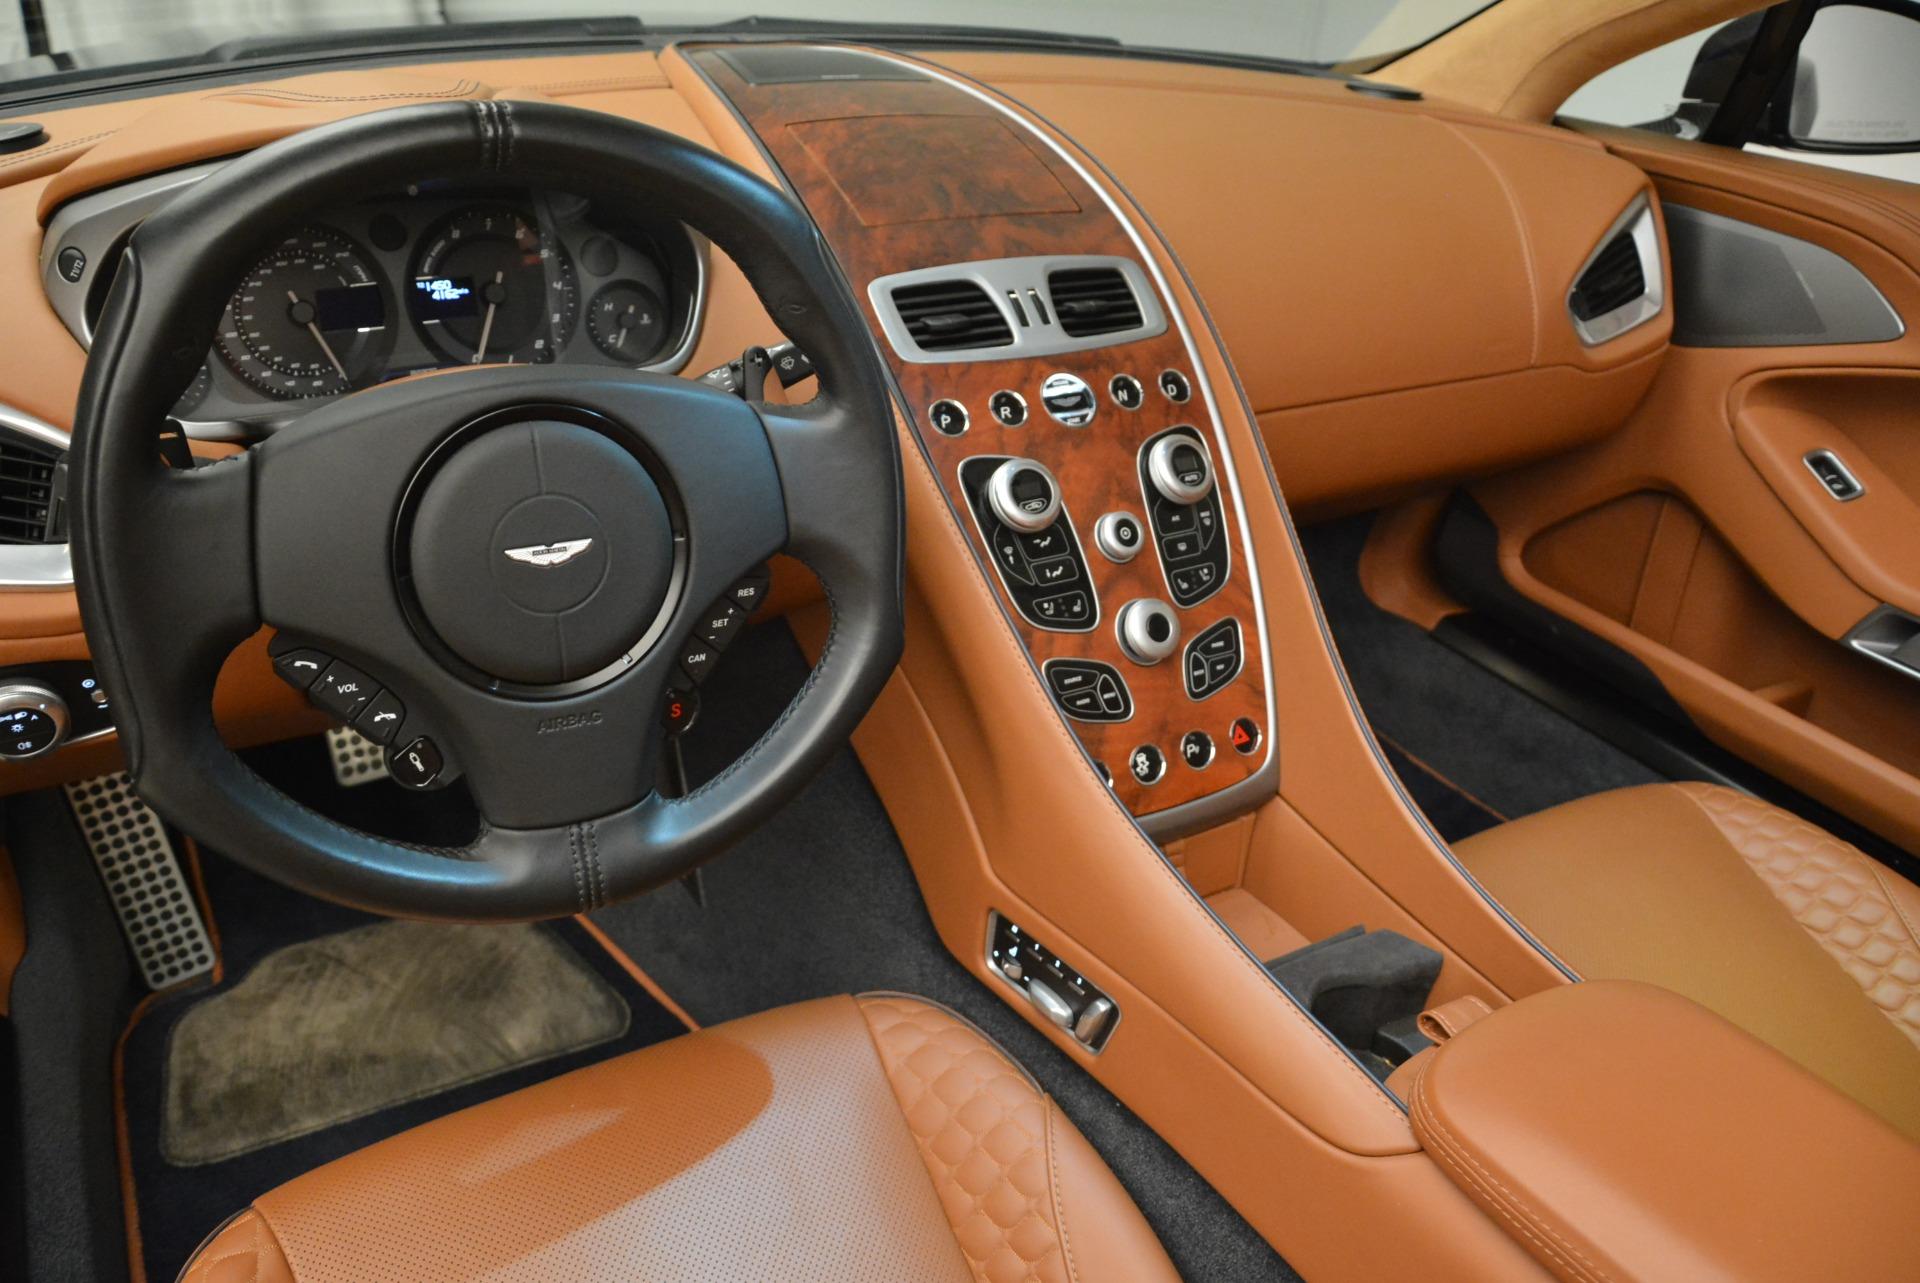 Used 2014 Aston Martin Vanquish Volante For Sale In Westport, CT 2097_p22